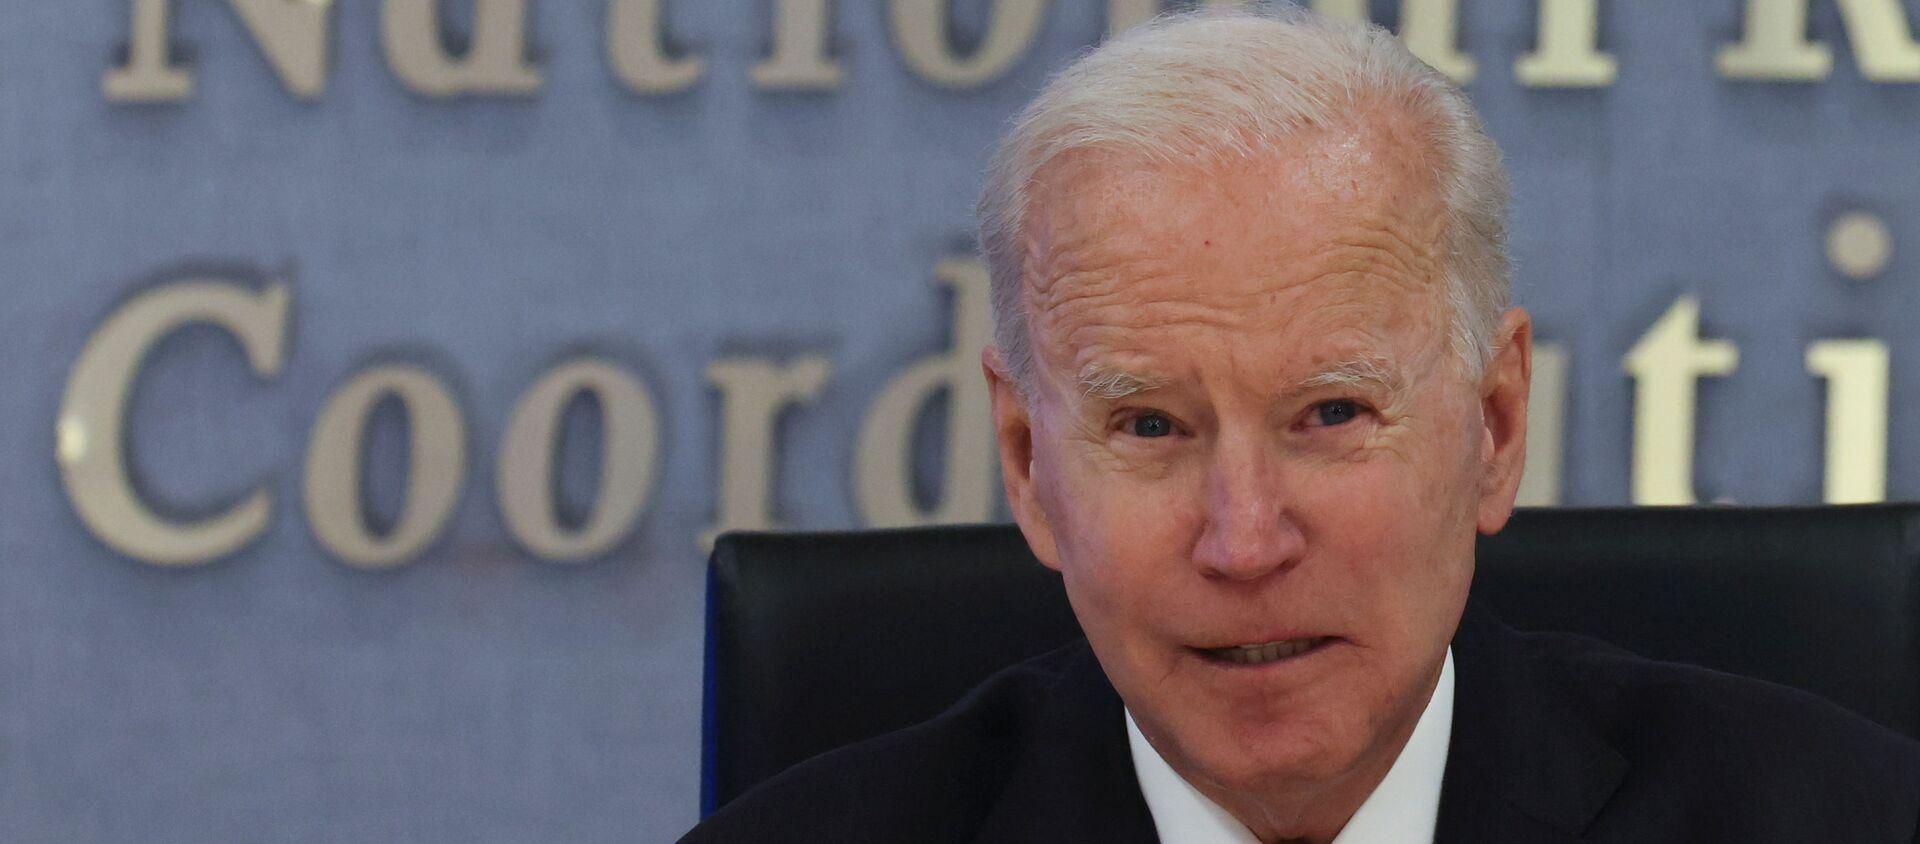 U.S. President Joe Biden speaks visits Federal Emergency Management Agency (FEMA) headquarters to receive a briefing on the Atlantic hurricane season, in Washington, U.S., May 24, 2021. - Sputnik International, 1920, 24.05.2021